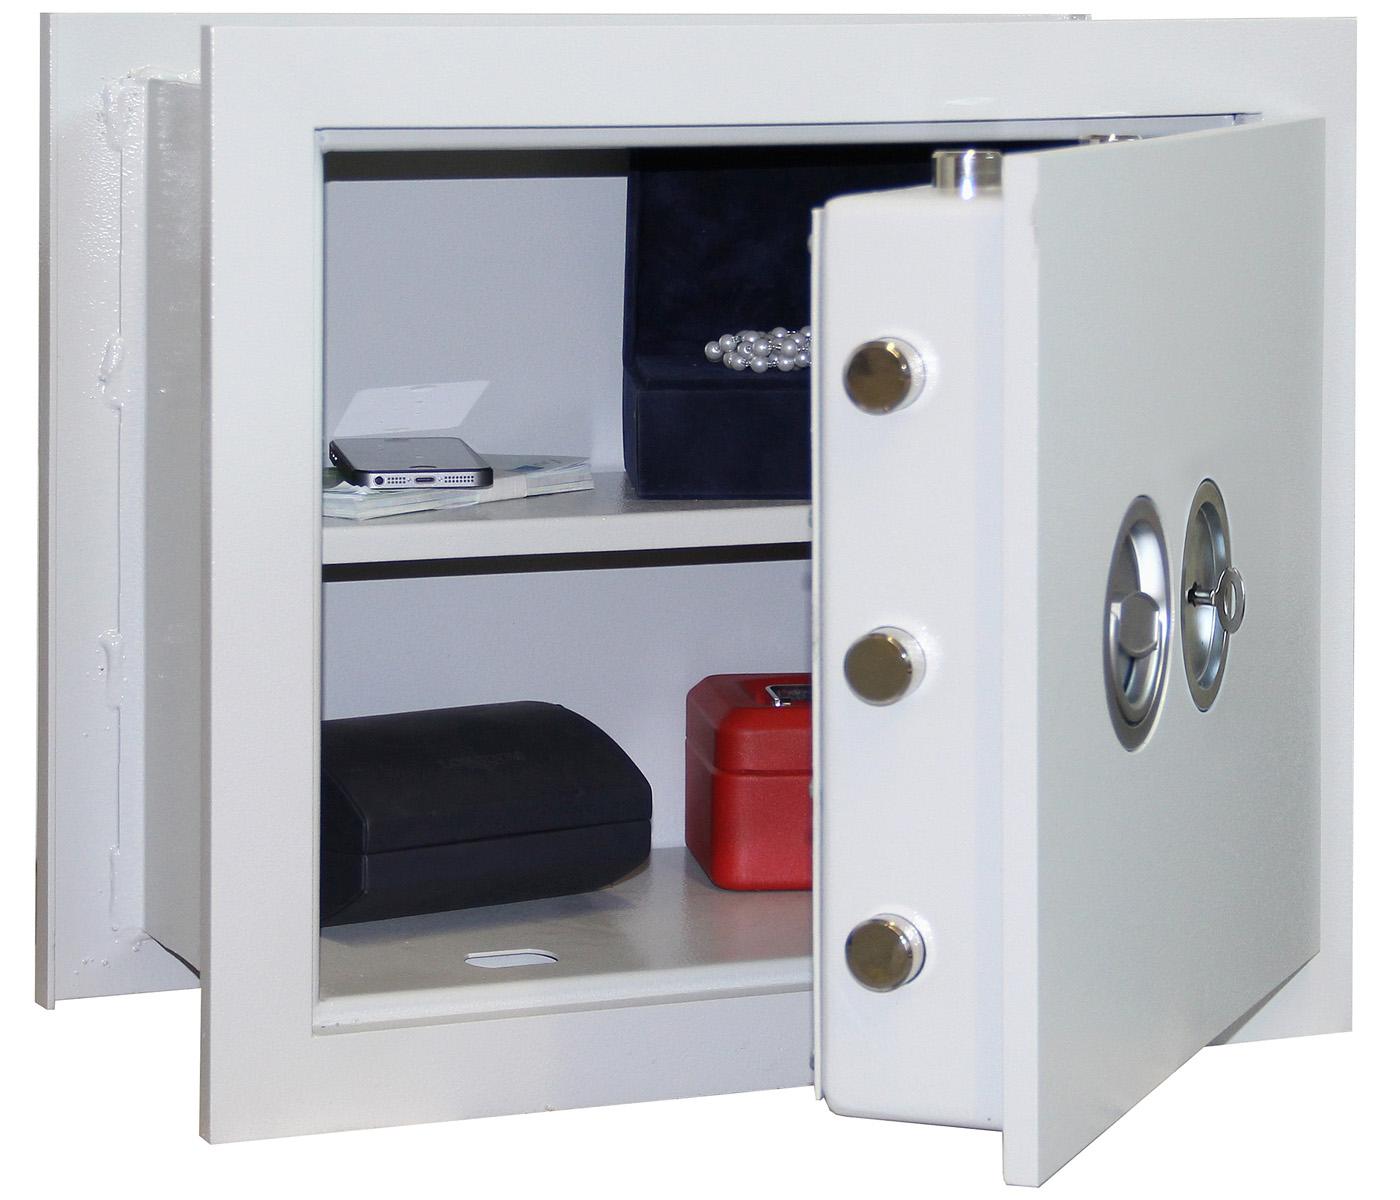 wandtresor format wega 30 260 en 1143 1 einmauertresor vds klasse 1. Black Bedroom Furniture Sets. Home Design Ideas